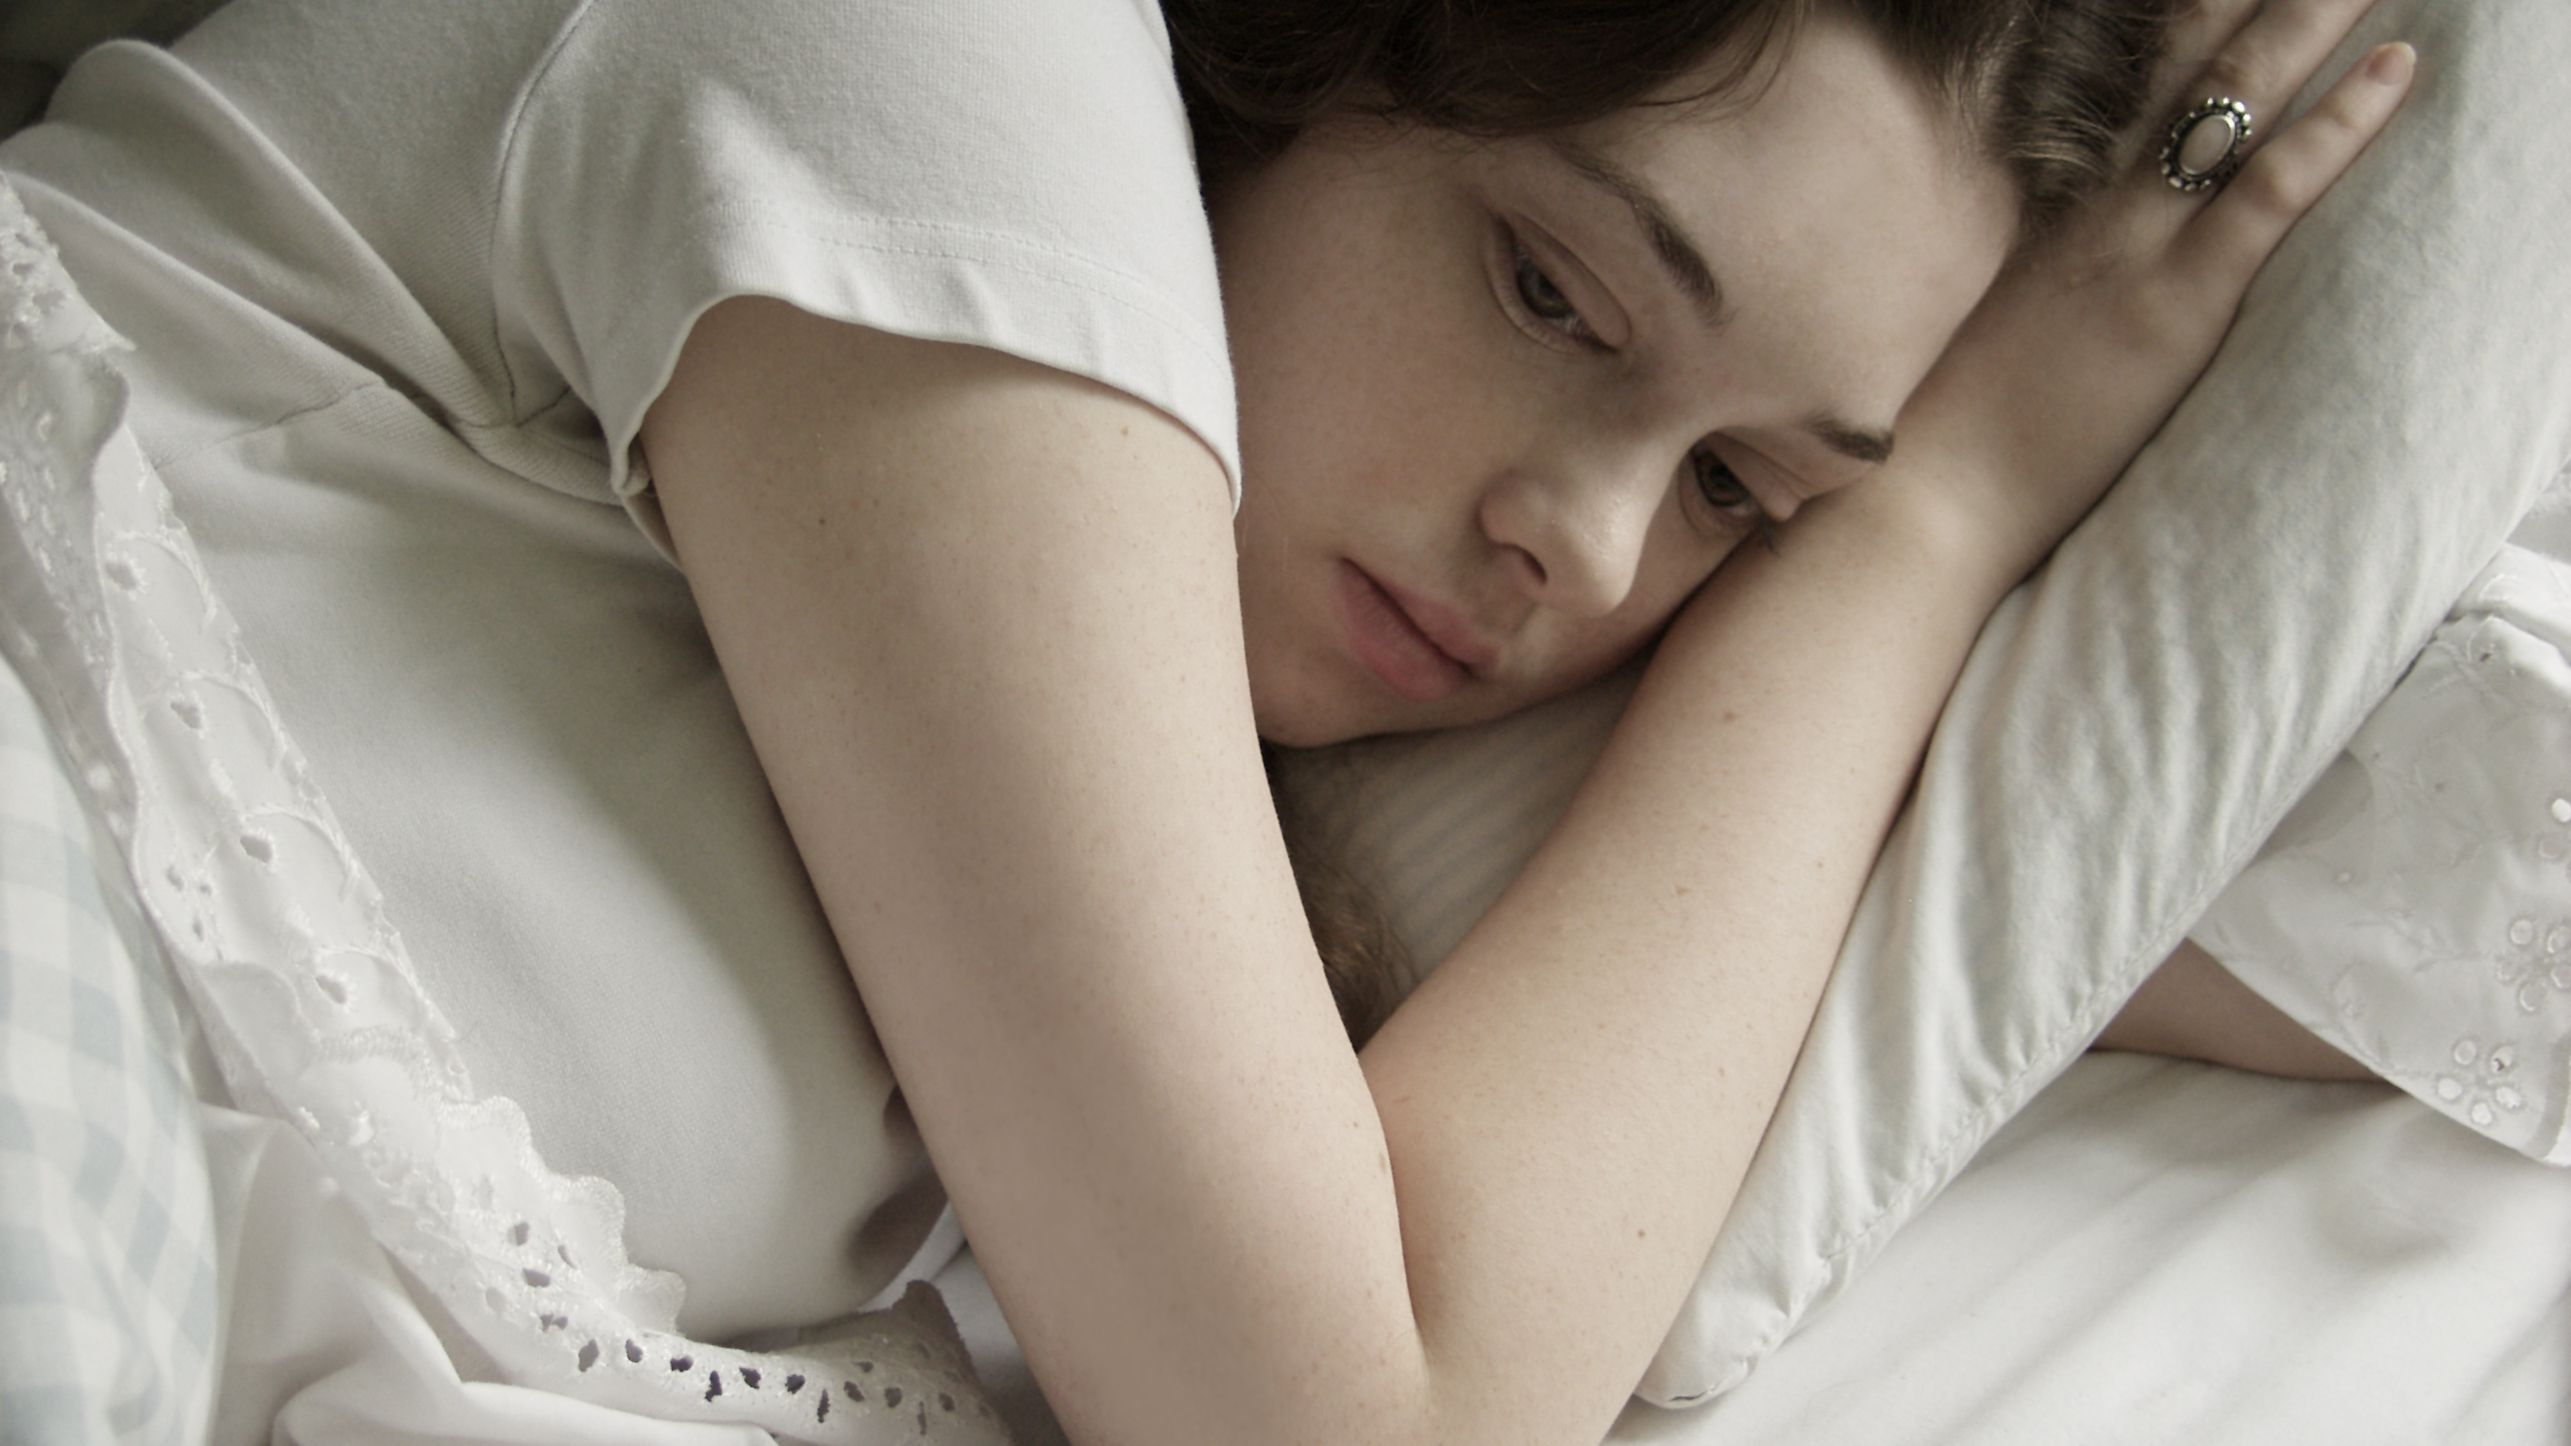 sleep-deprivation-Diane-Diederich-E-Getty-Images-56b751855f9b5829f83848da